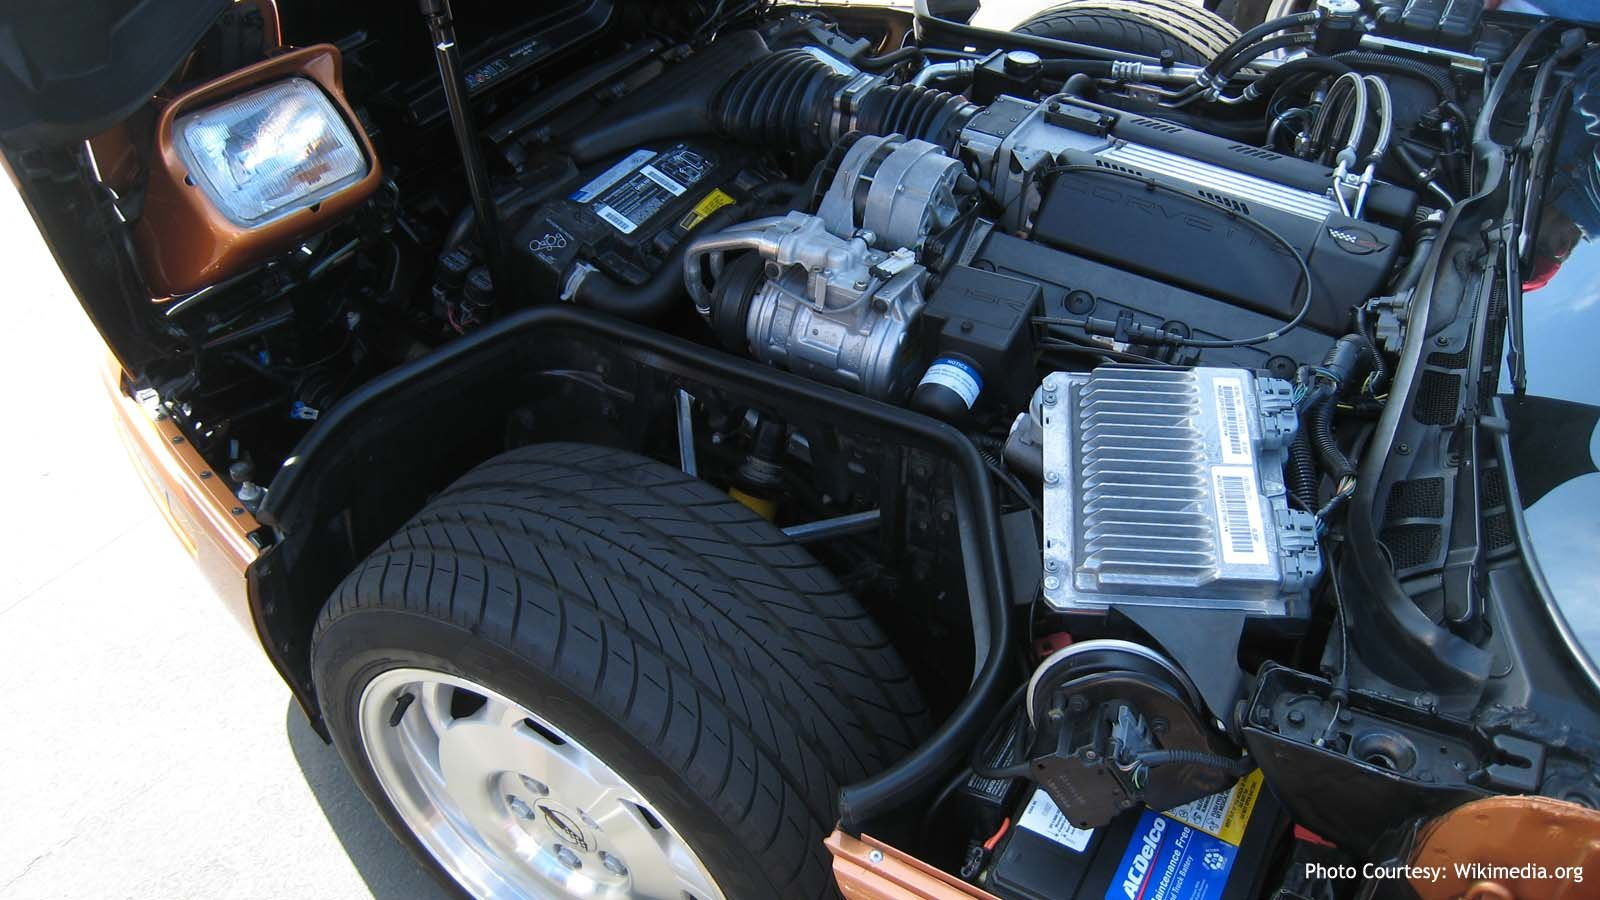 6 Reasons to Buy a C4 Corvette